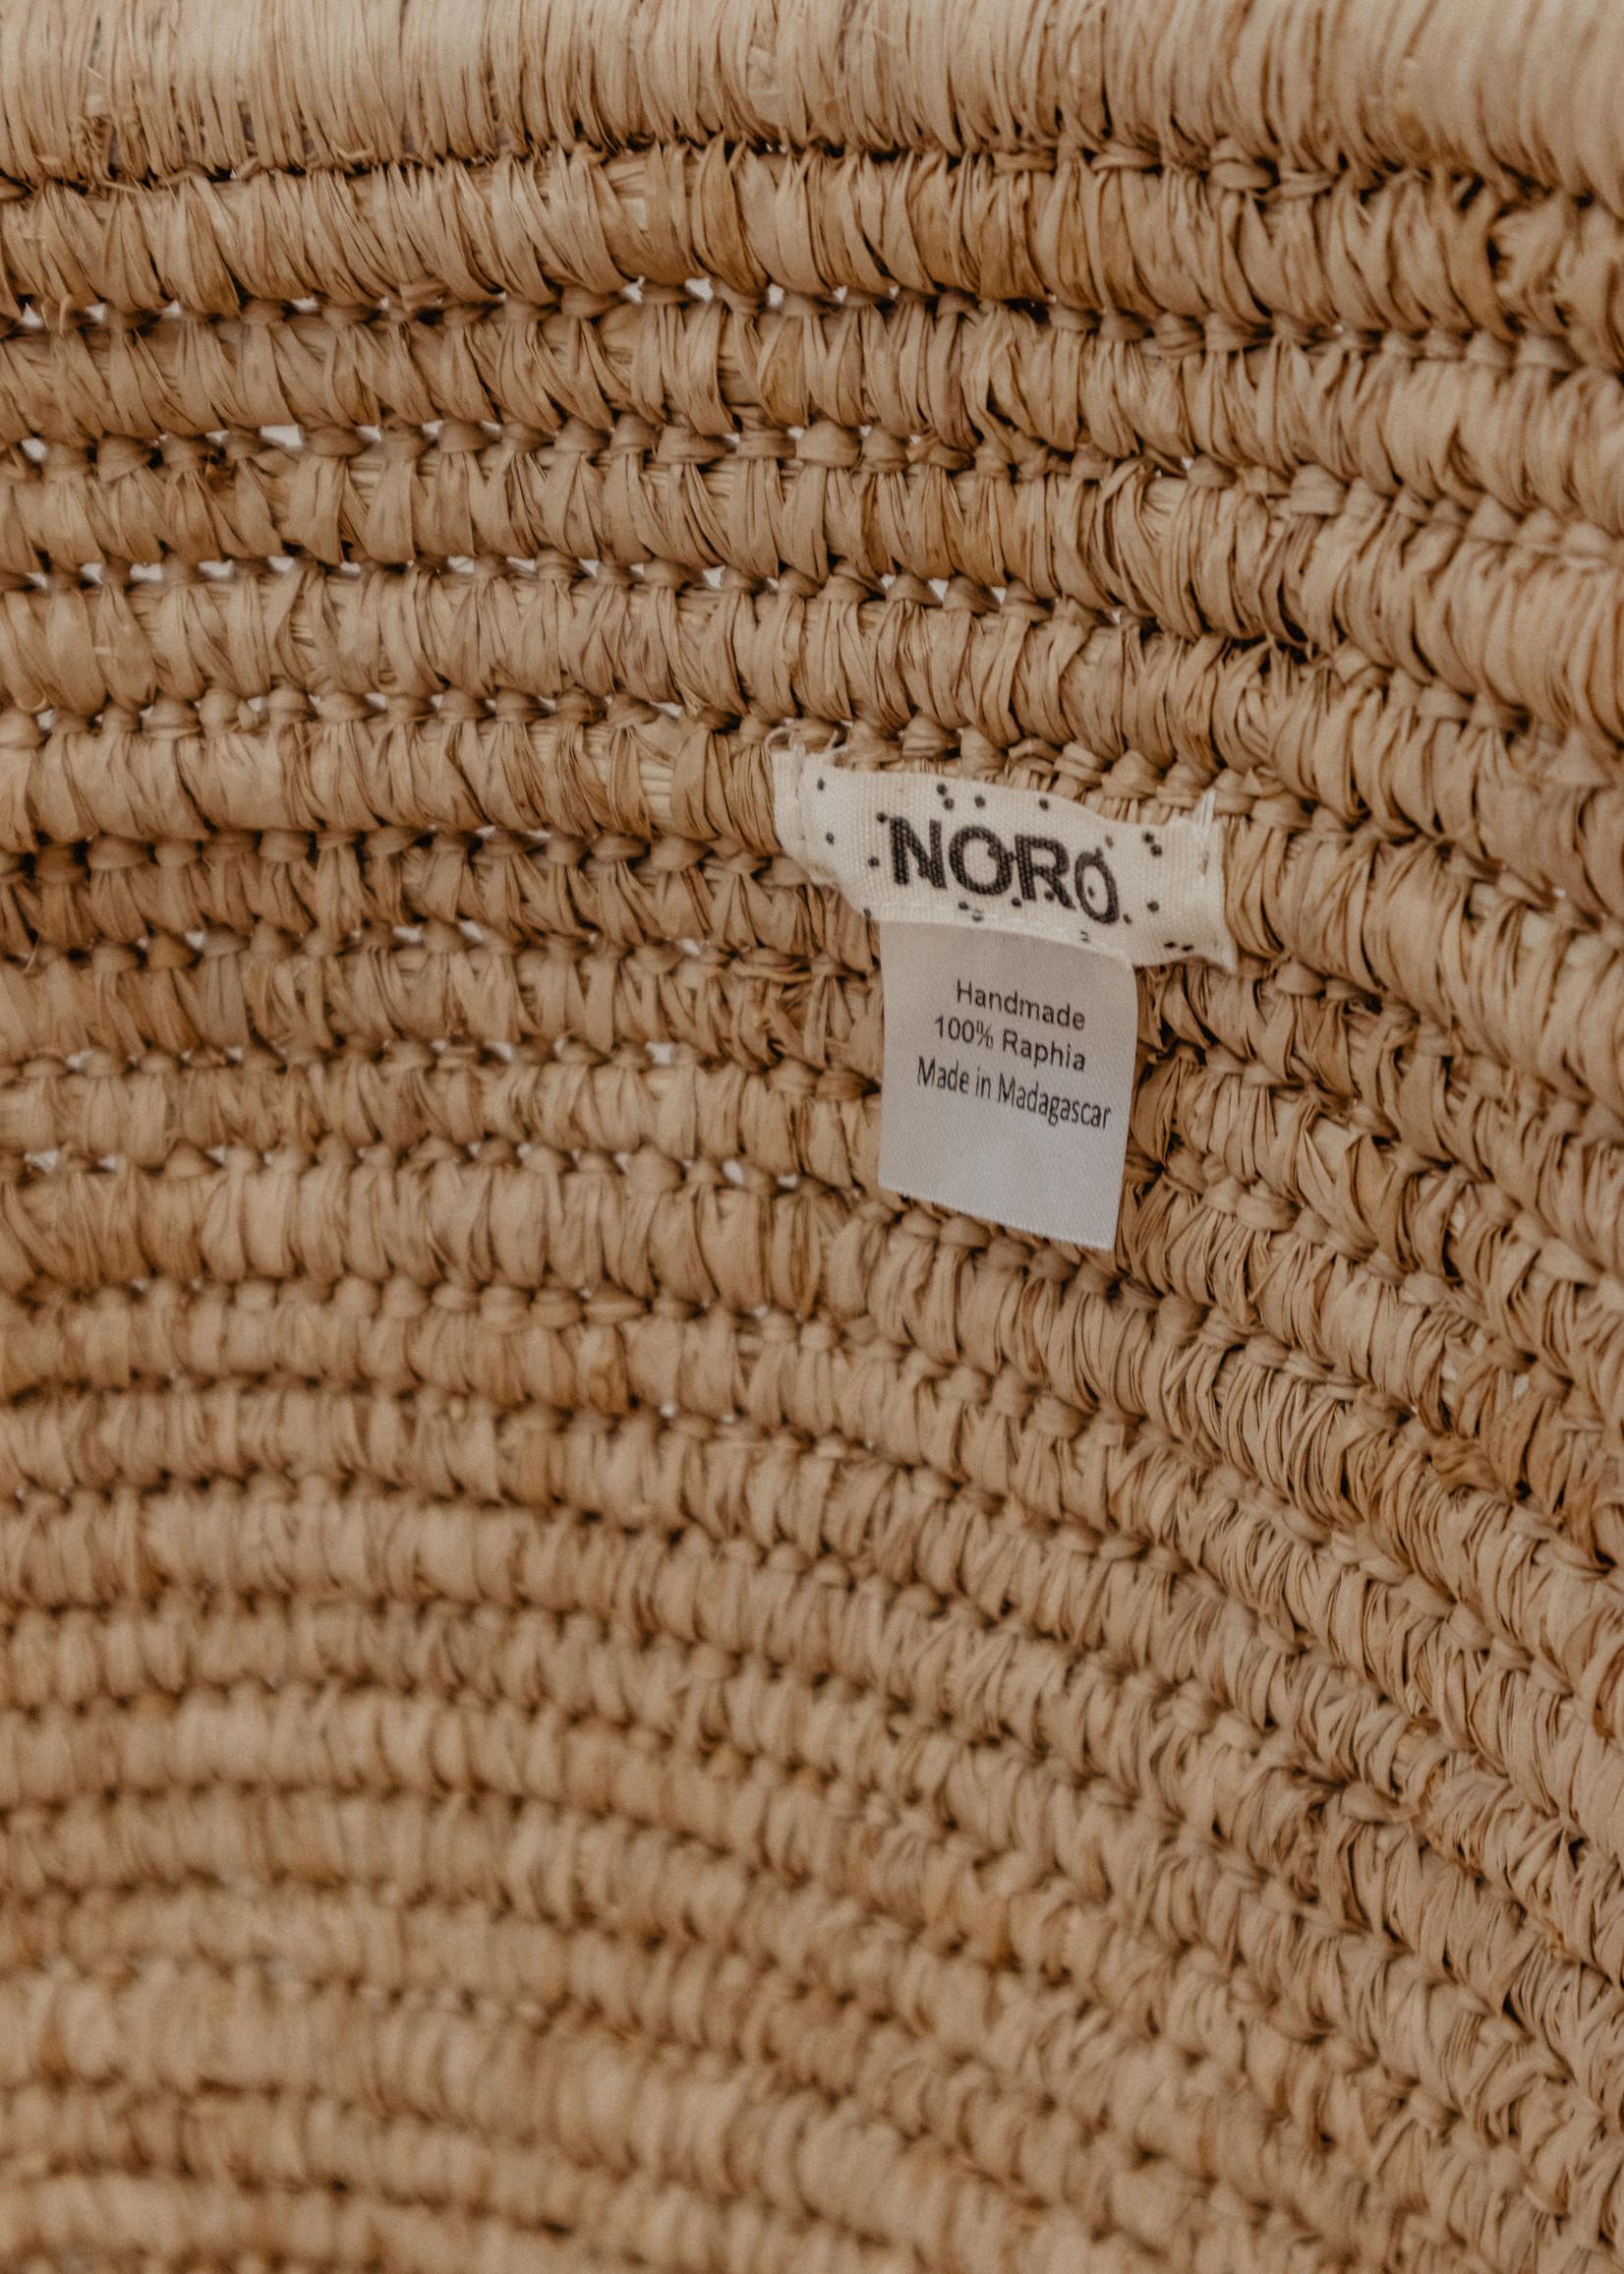 Noro Paris Moses Basket - Handmade & Fairtrade